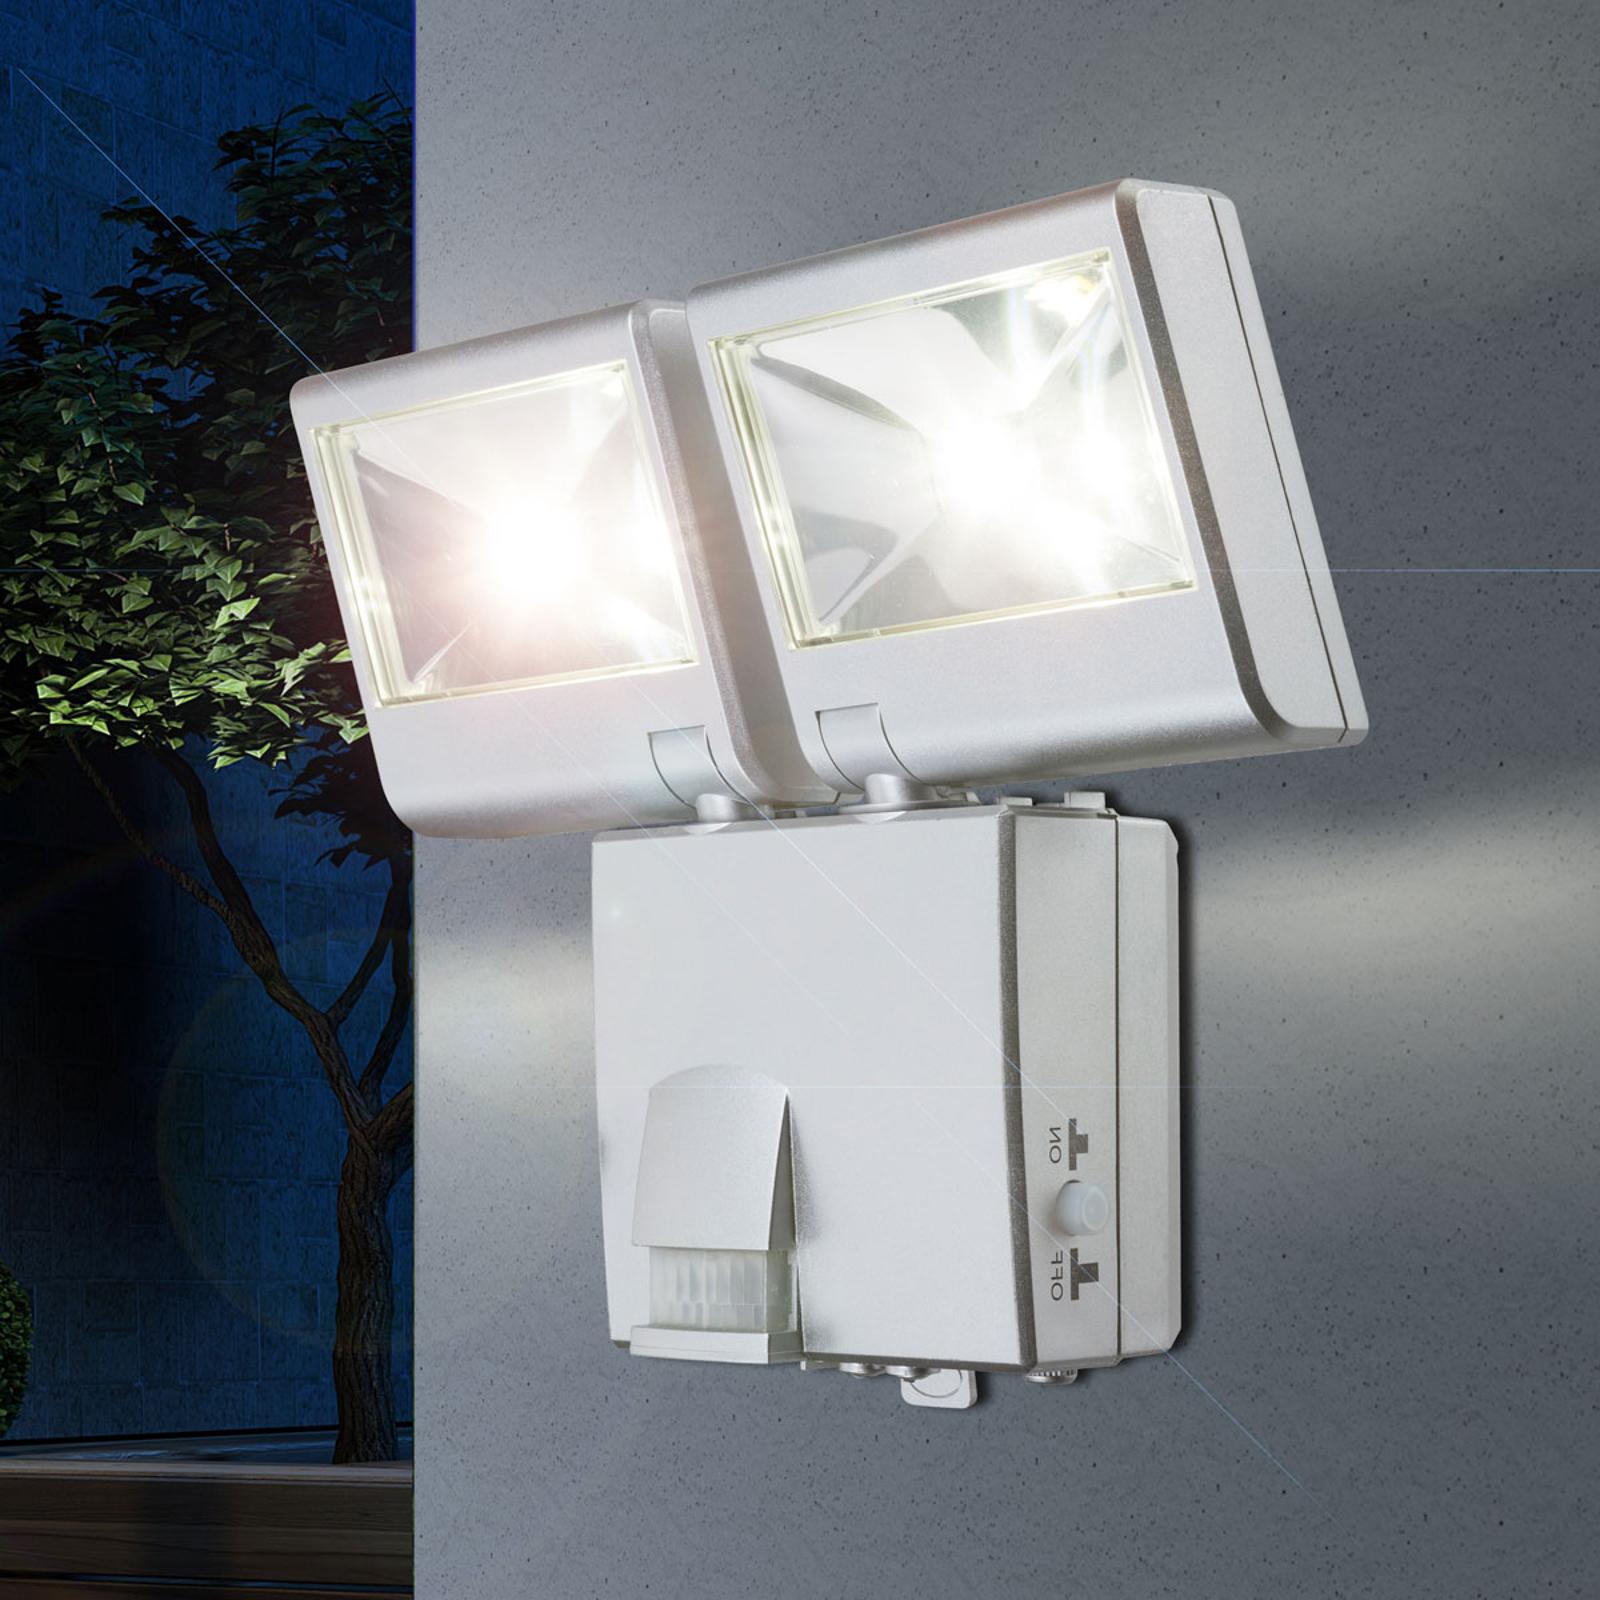 LED-Außenwandleuchte 3724S Sensor Batteriebetrieb